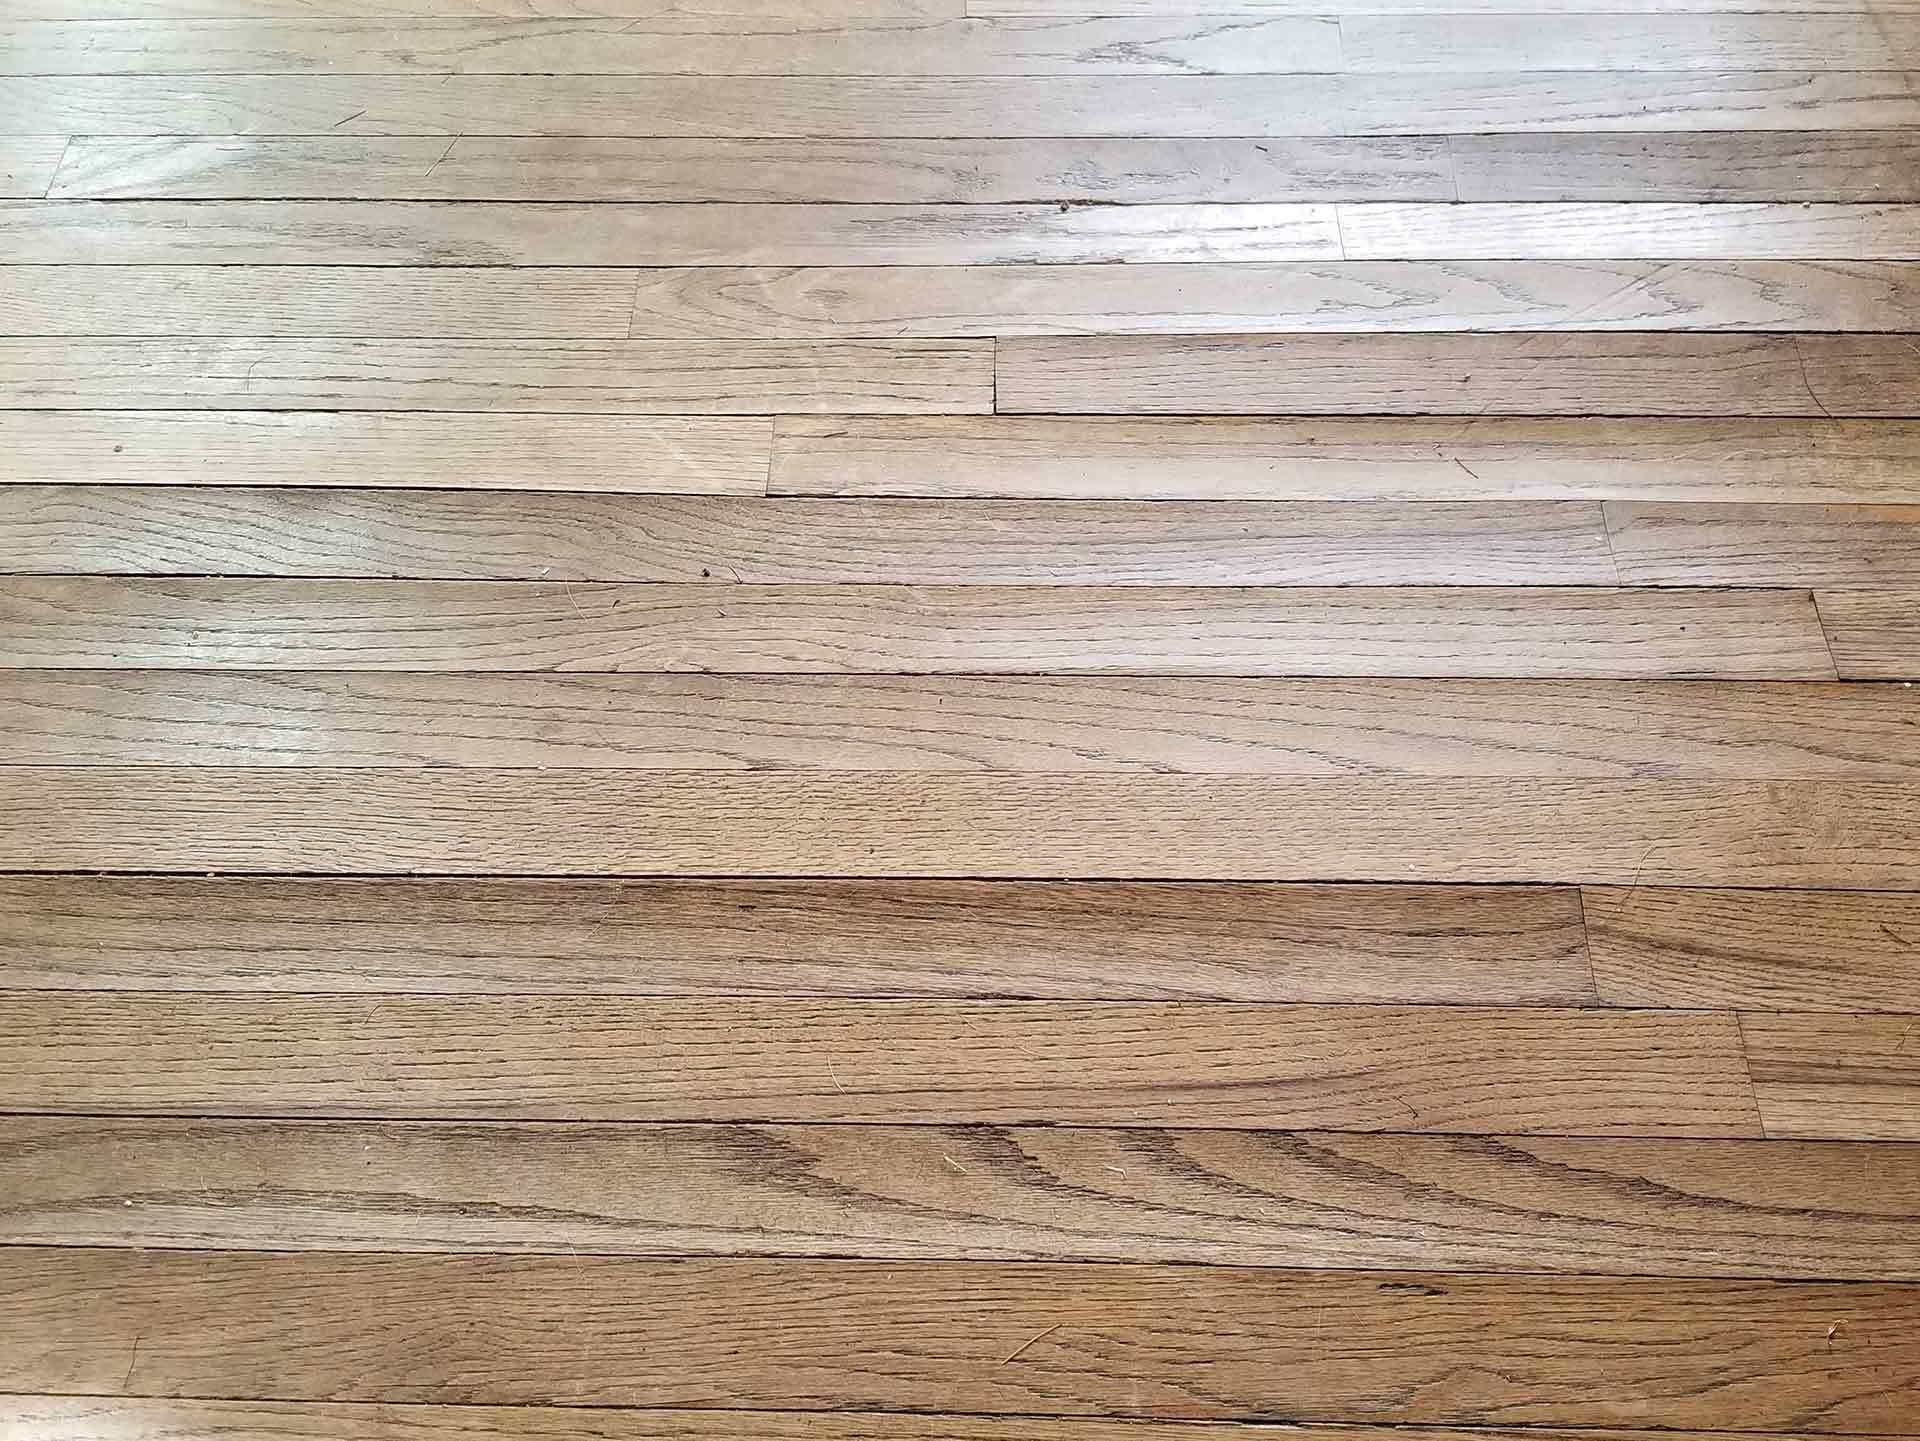 Buckling Floors